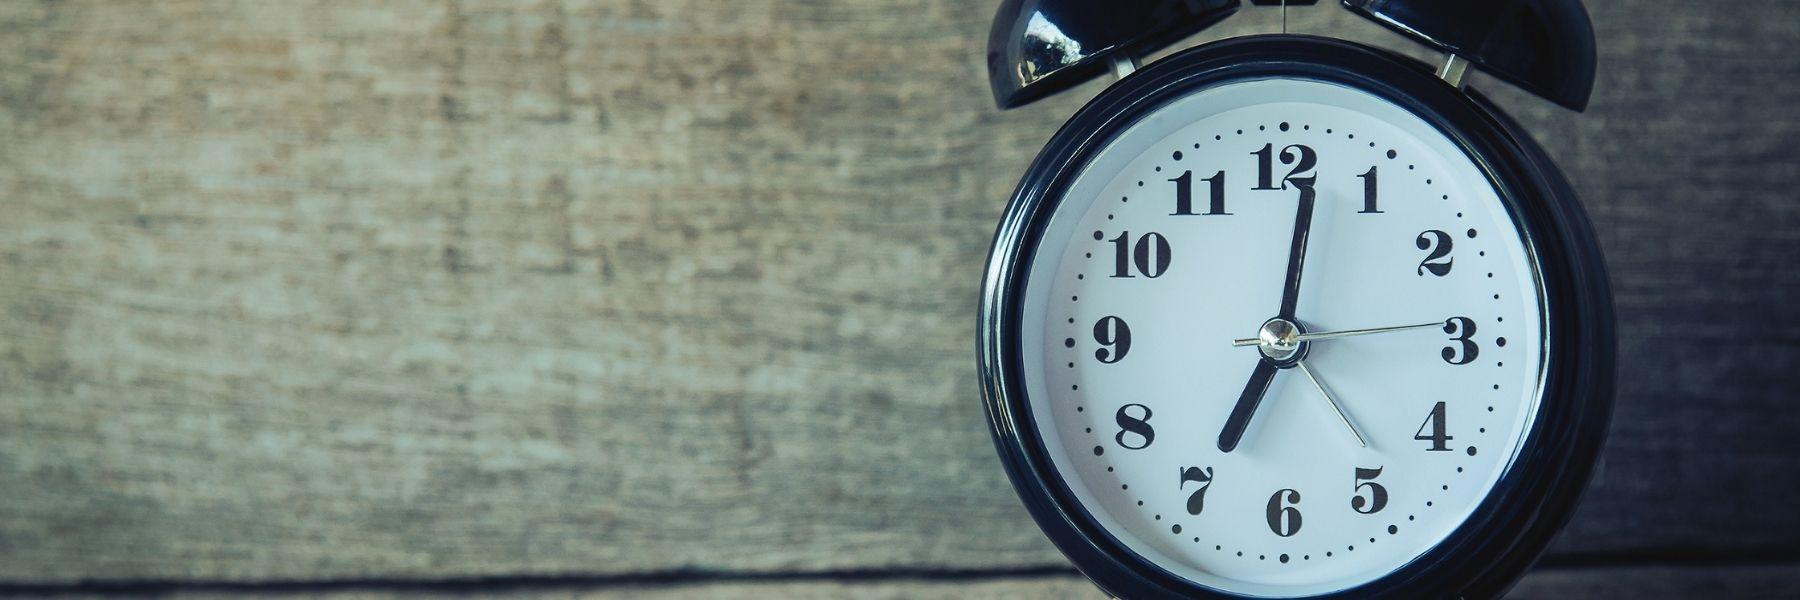 Alarm clock against wooden background